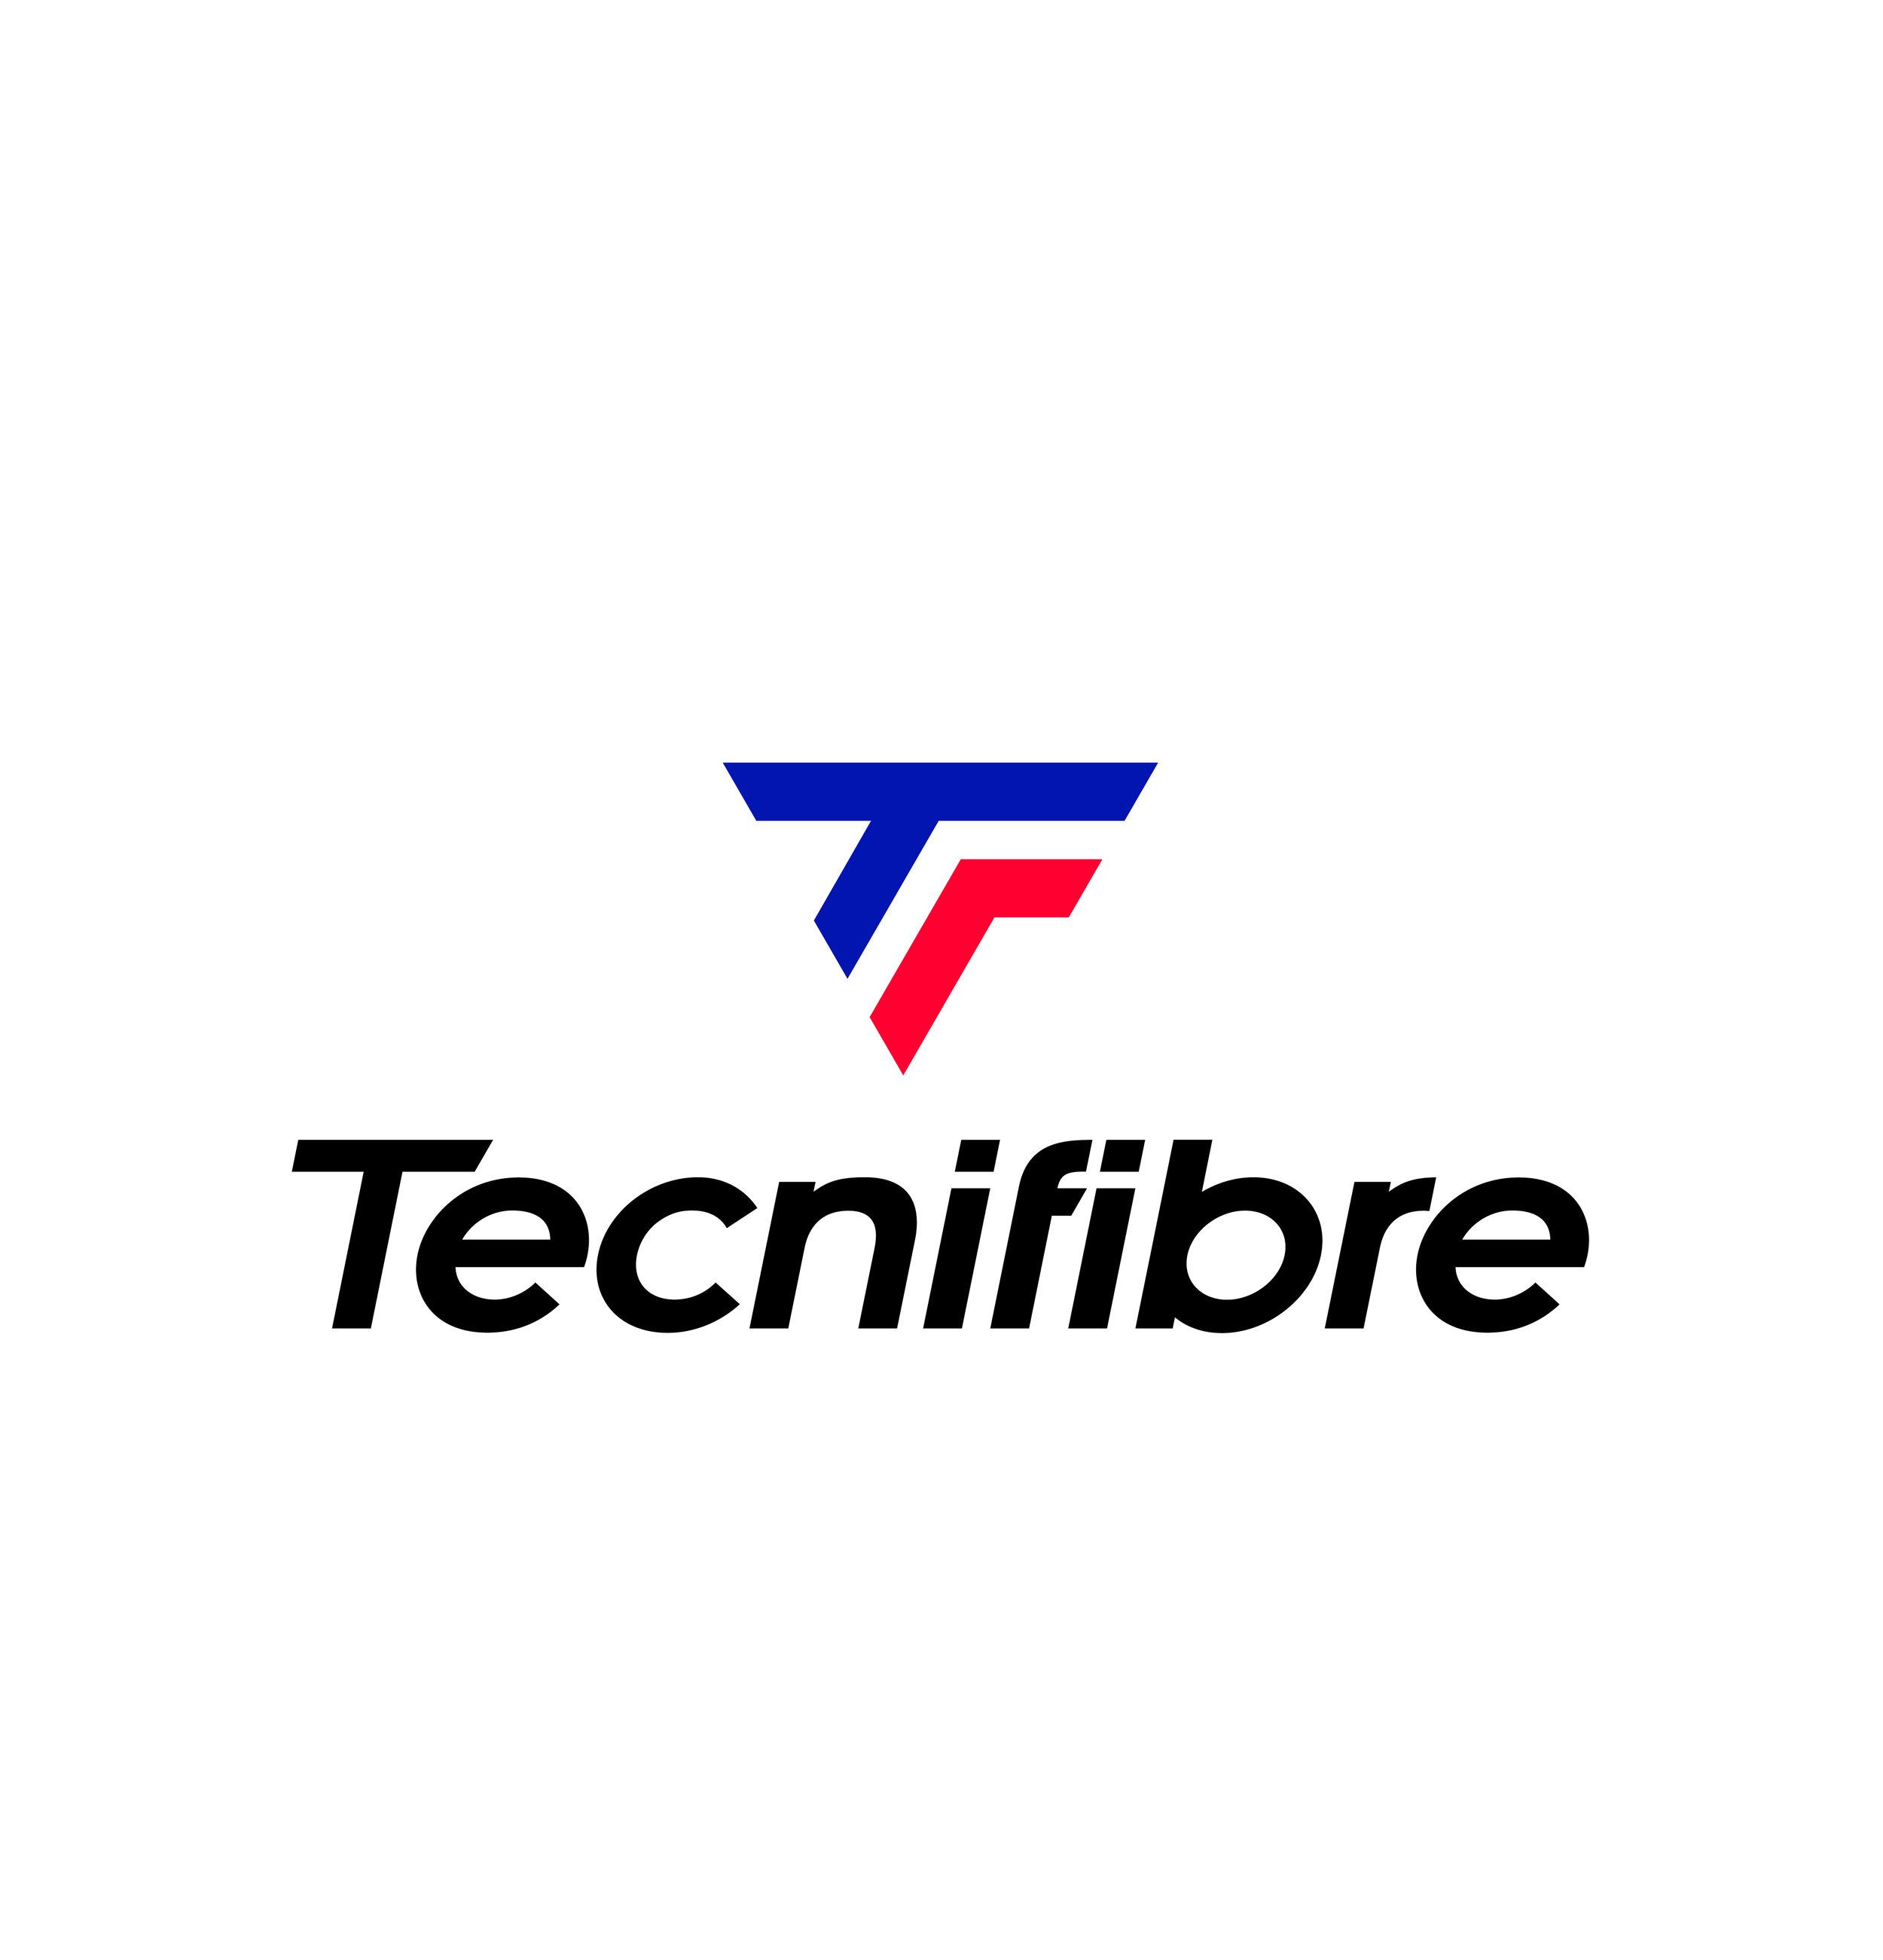 TECNIFIBRE logotype CMJN MNSTR_LOGO COMPACT - CMJN.jpg